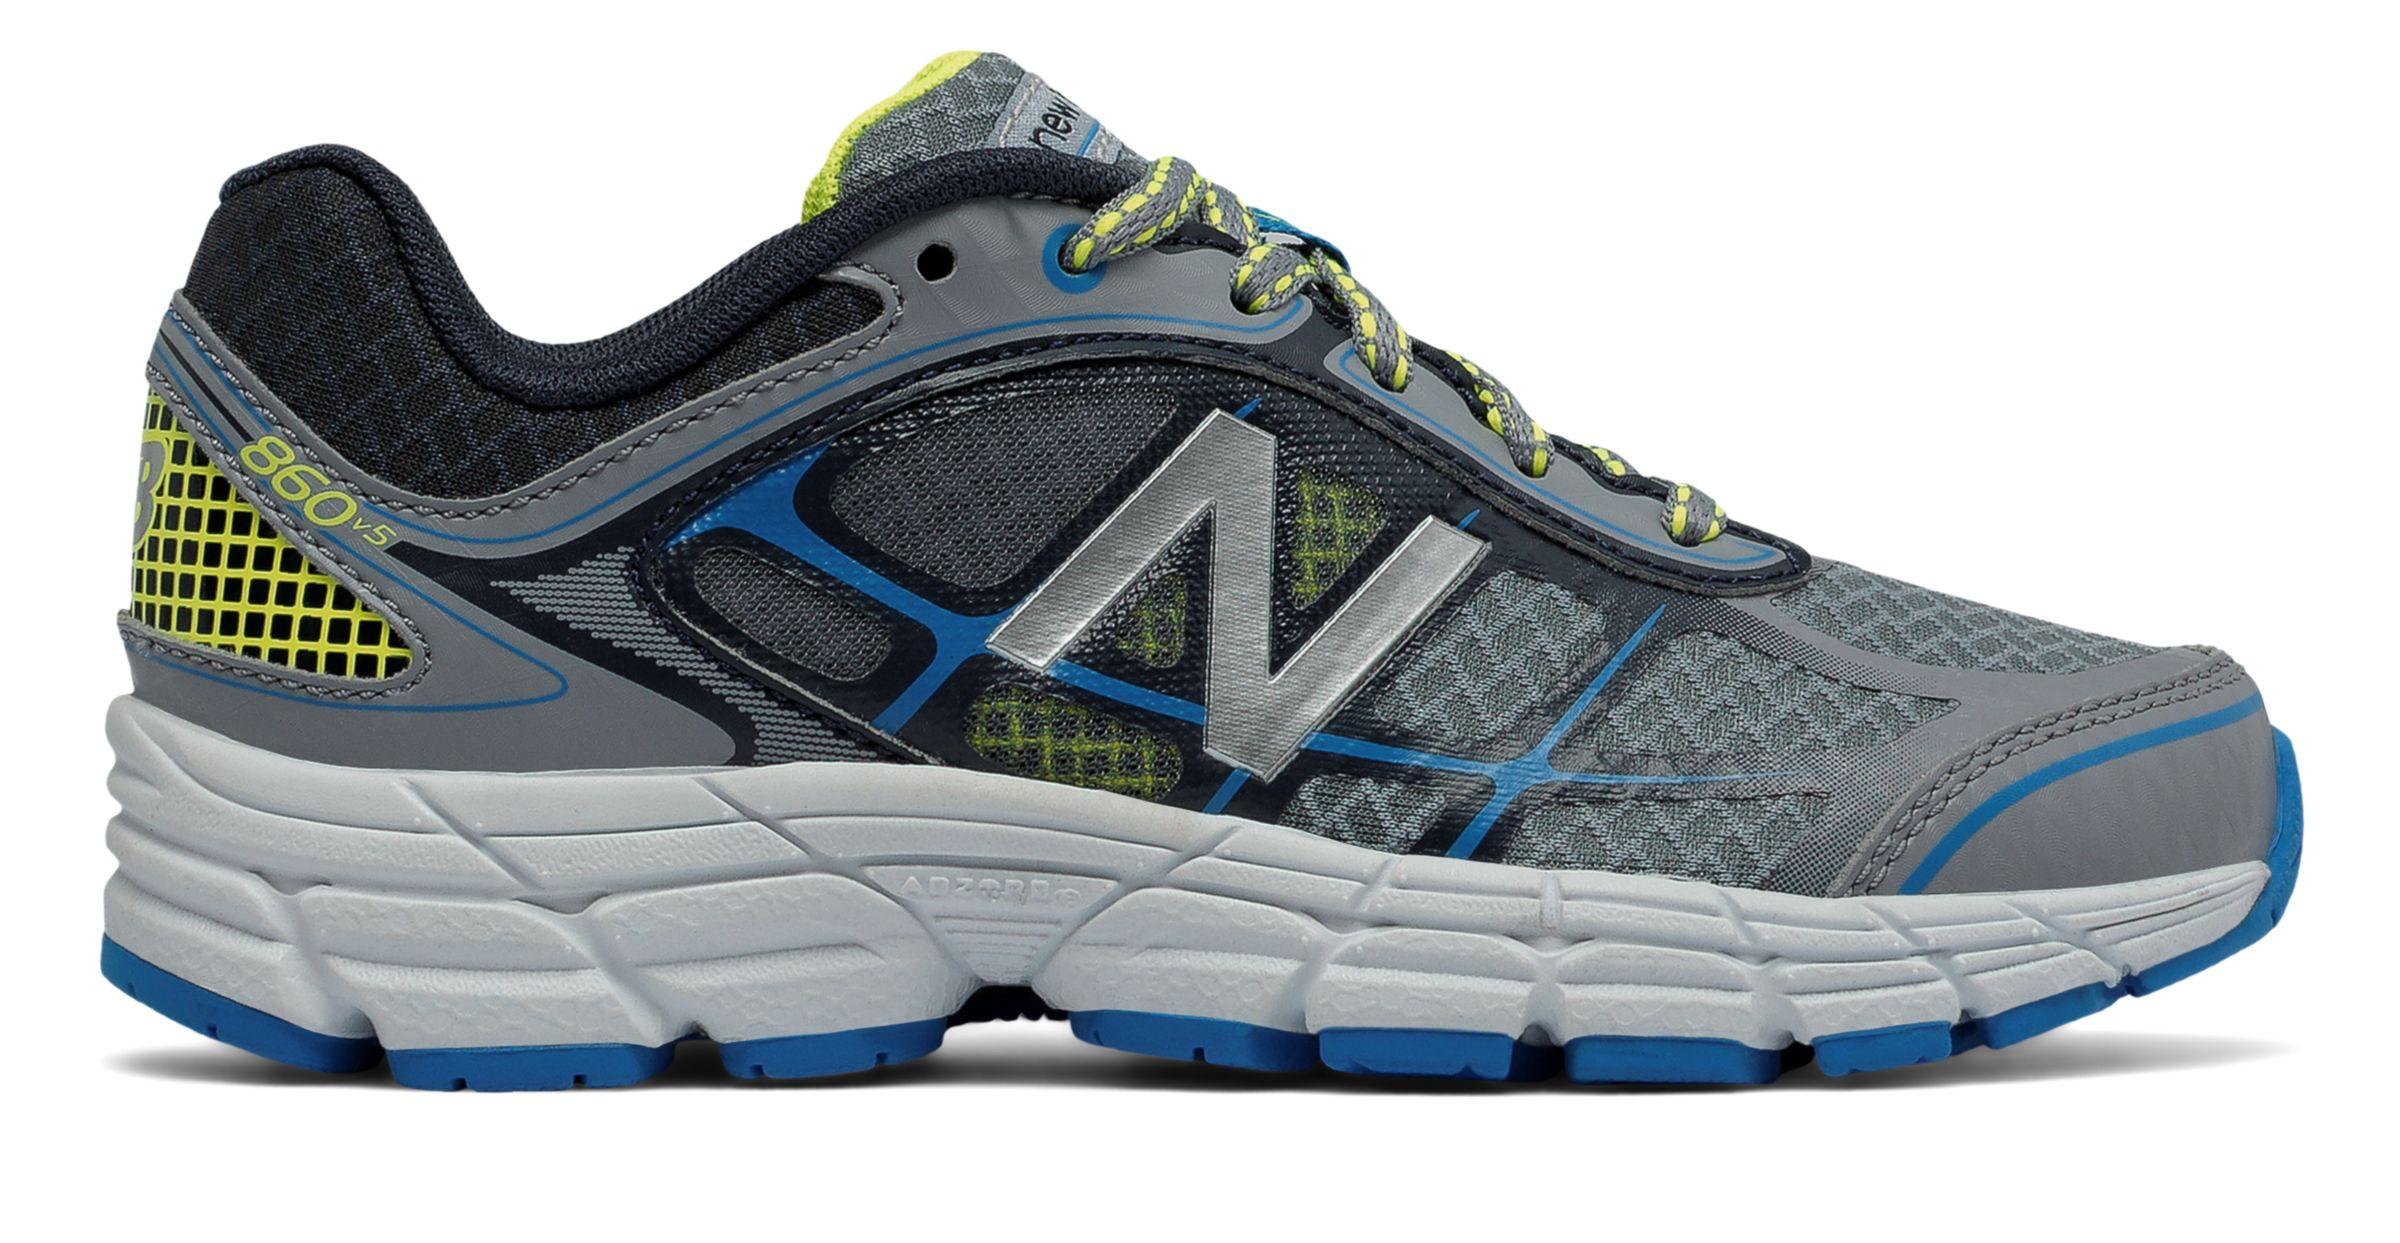 NB New Balance 860v5, Grey with Bolt & Yellow